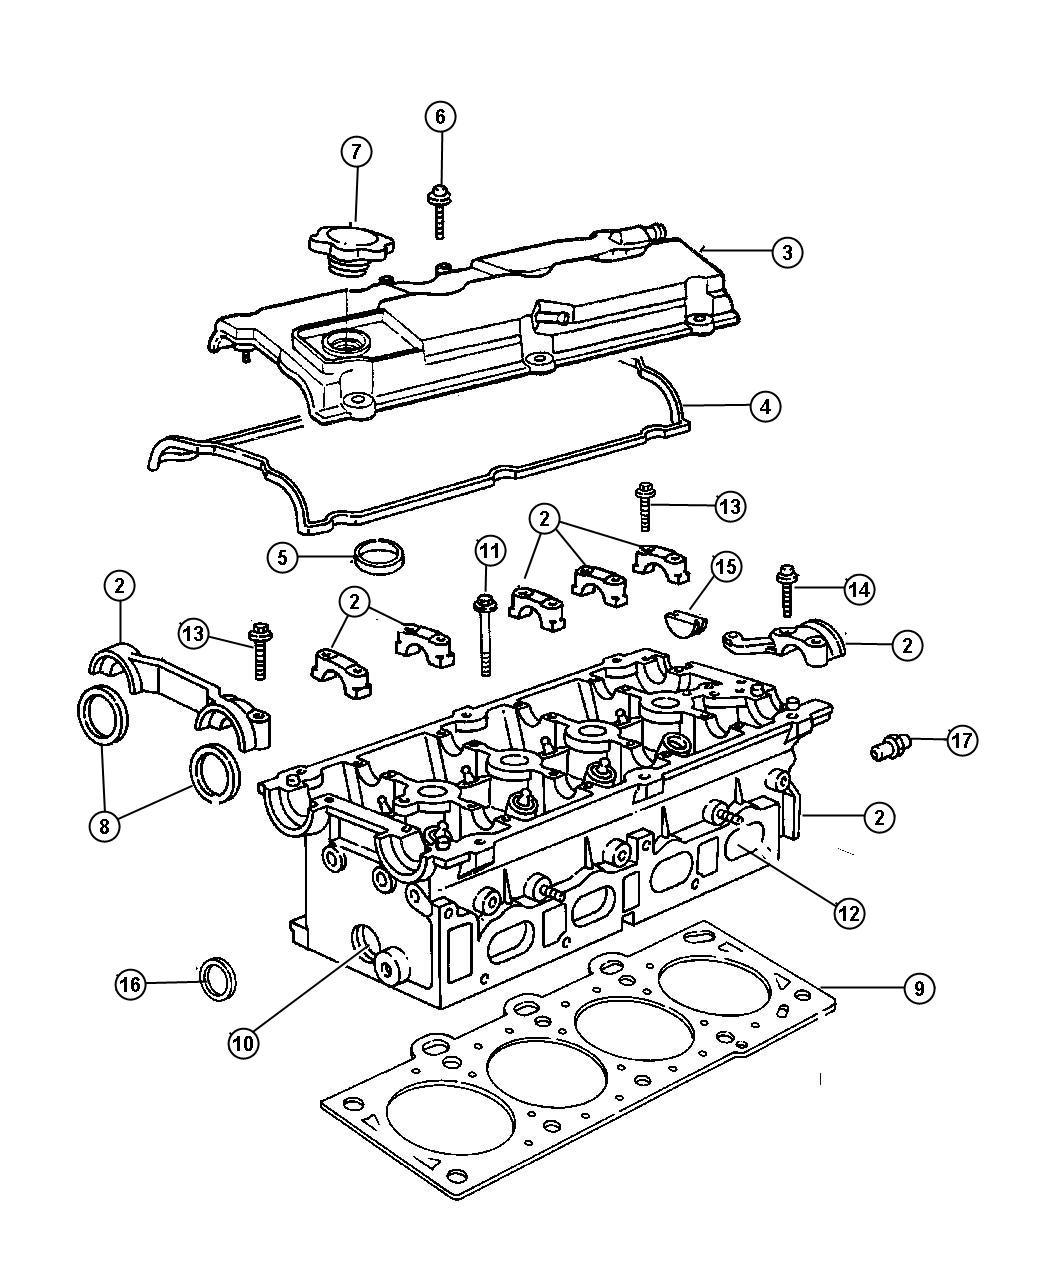 Dodge Durango Head Cylinder Casting Number